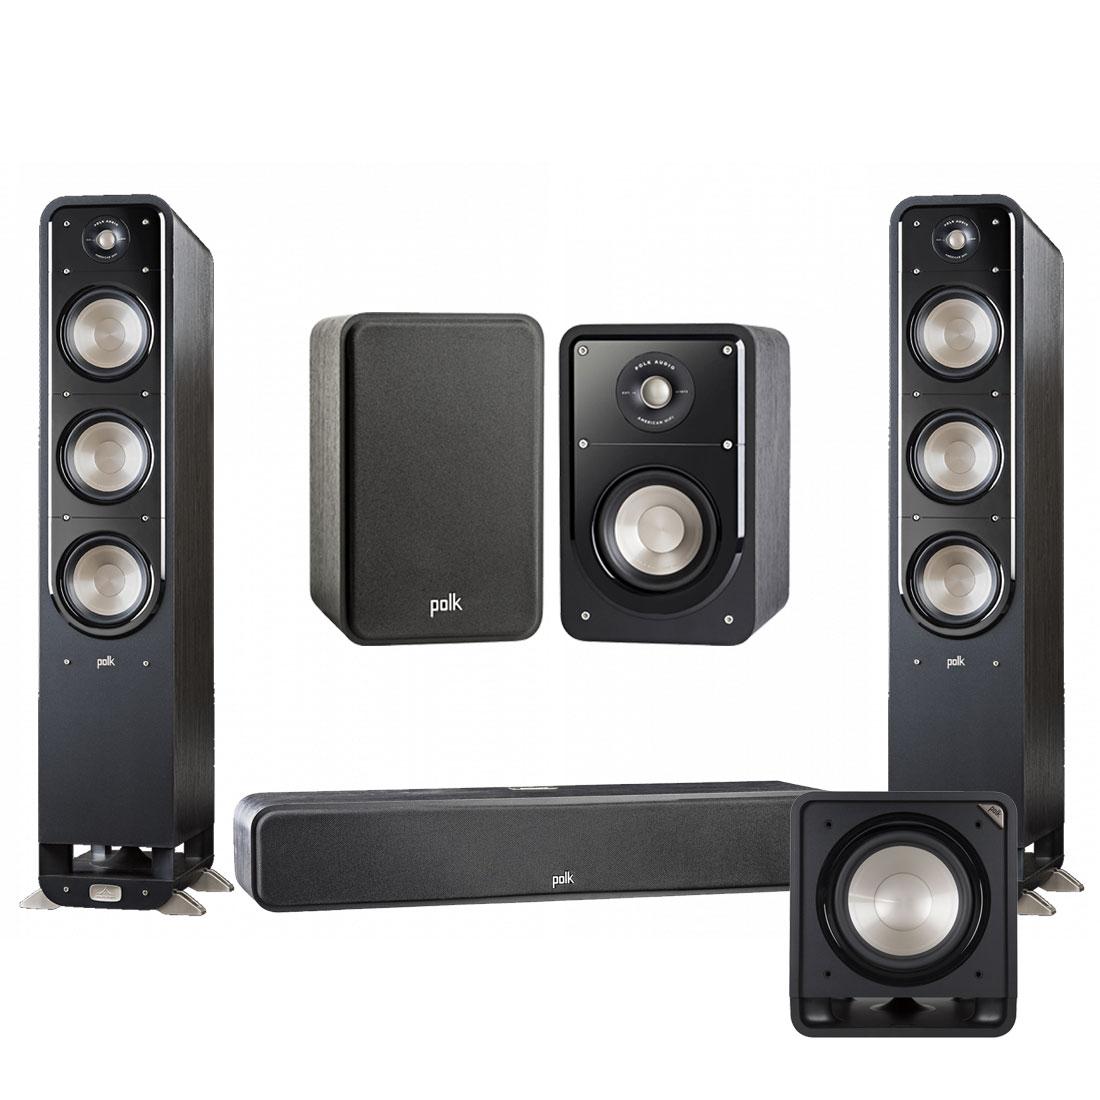 rp revival klipsch speakers reference bookshelf products vinyl premier most fitzroy efficient